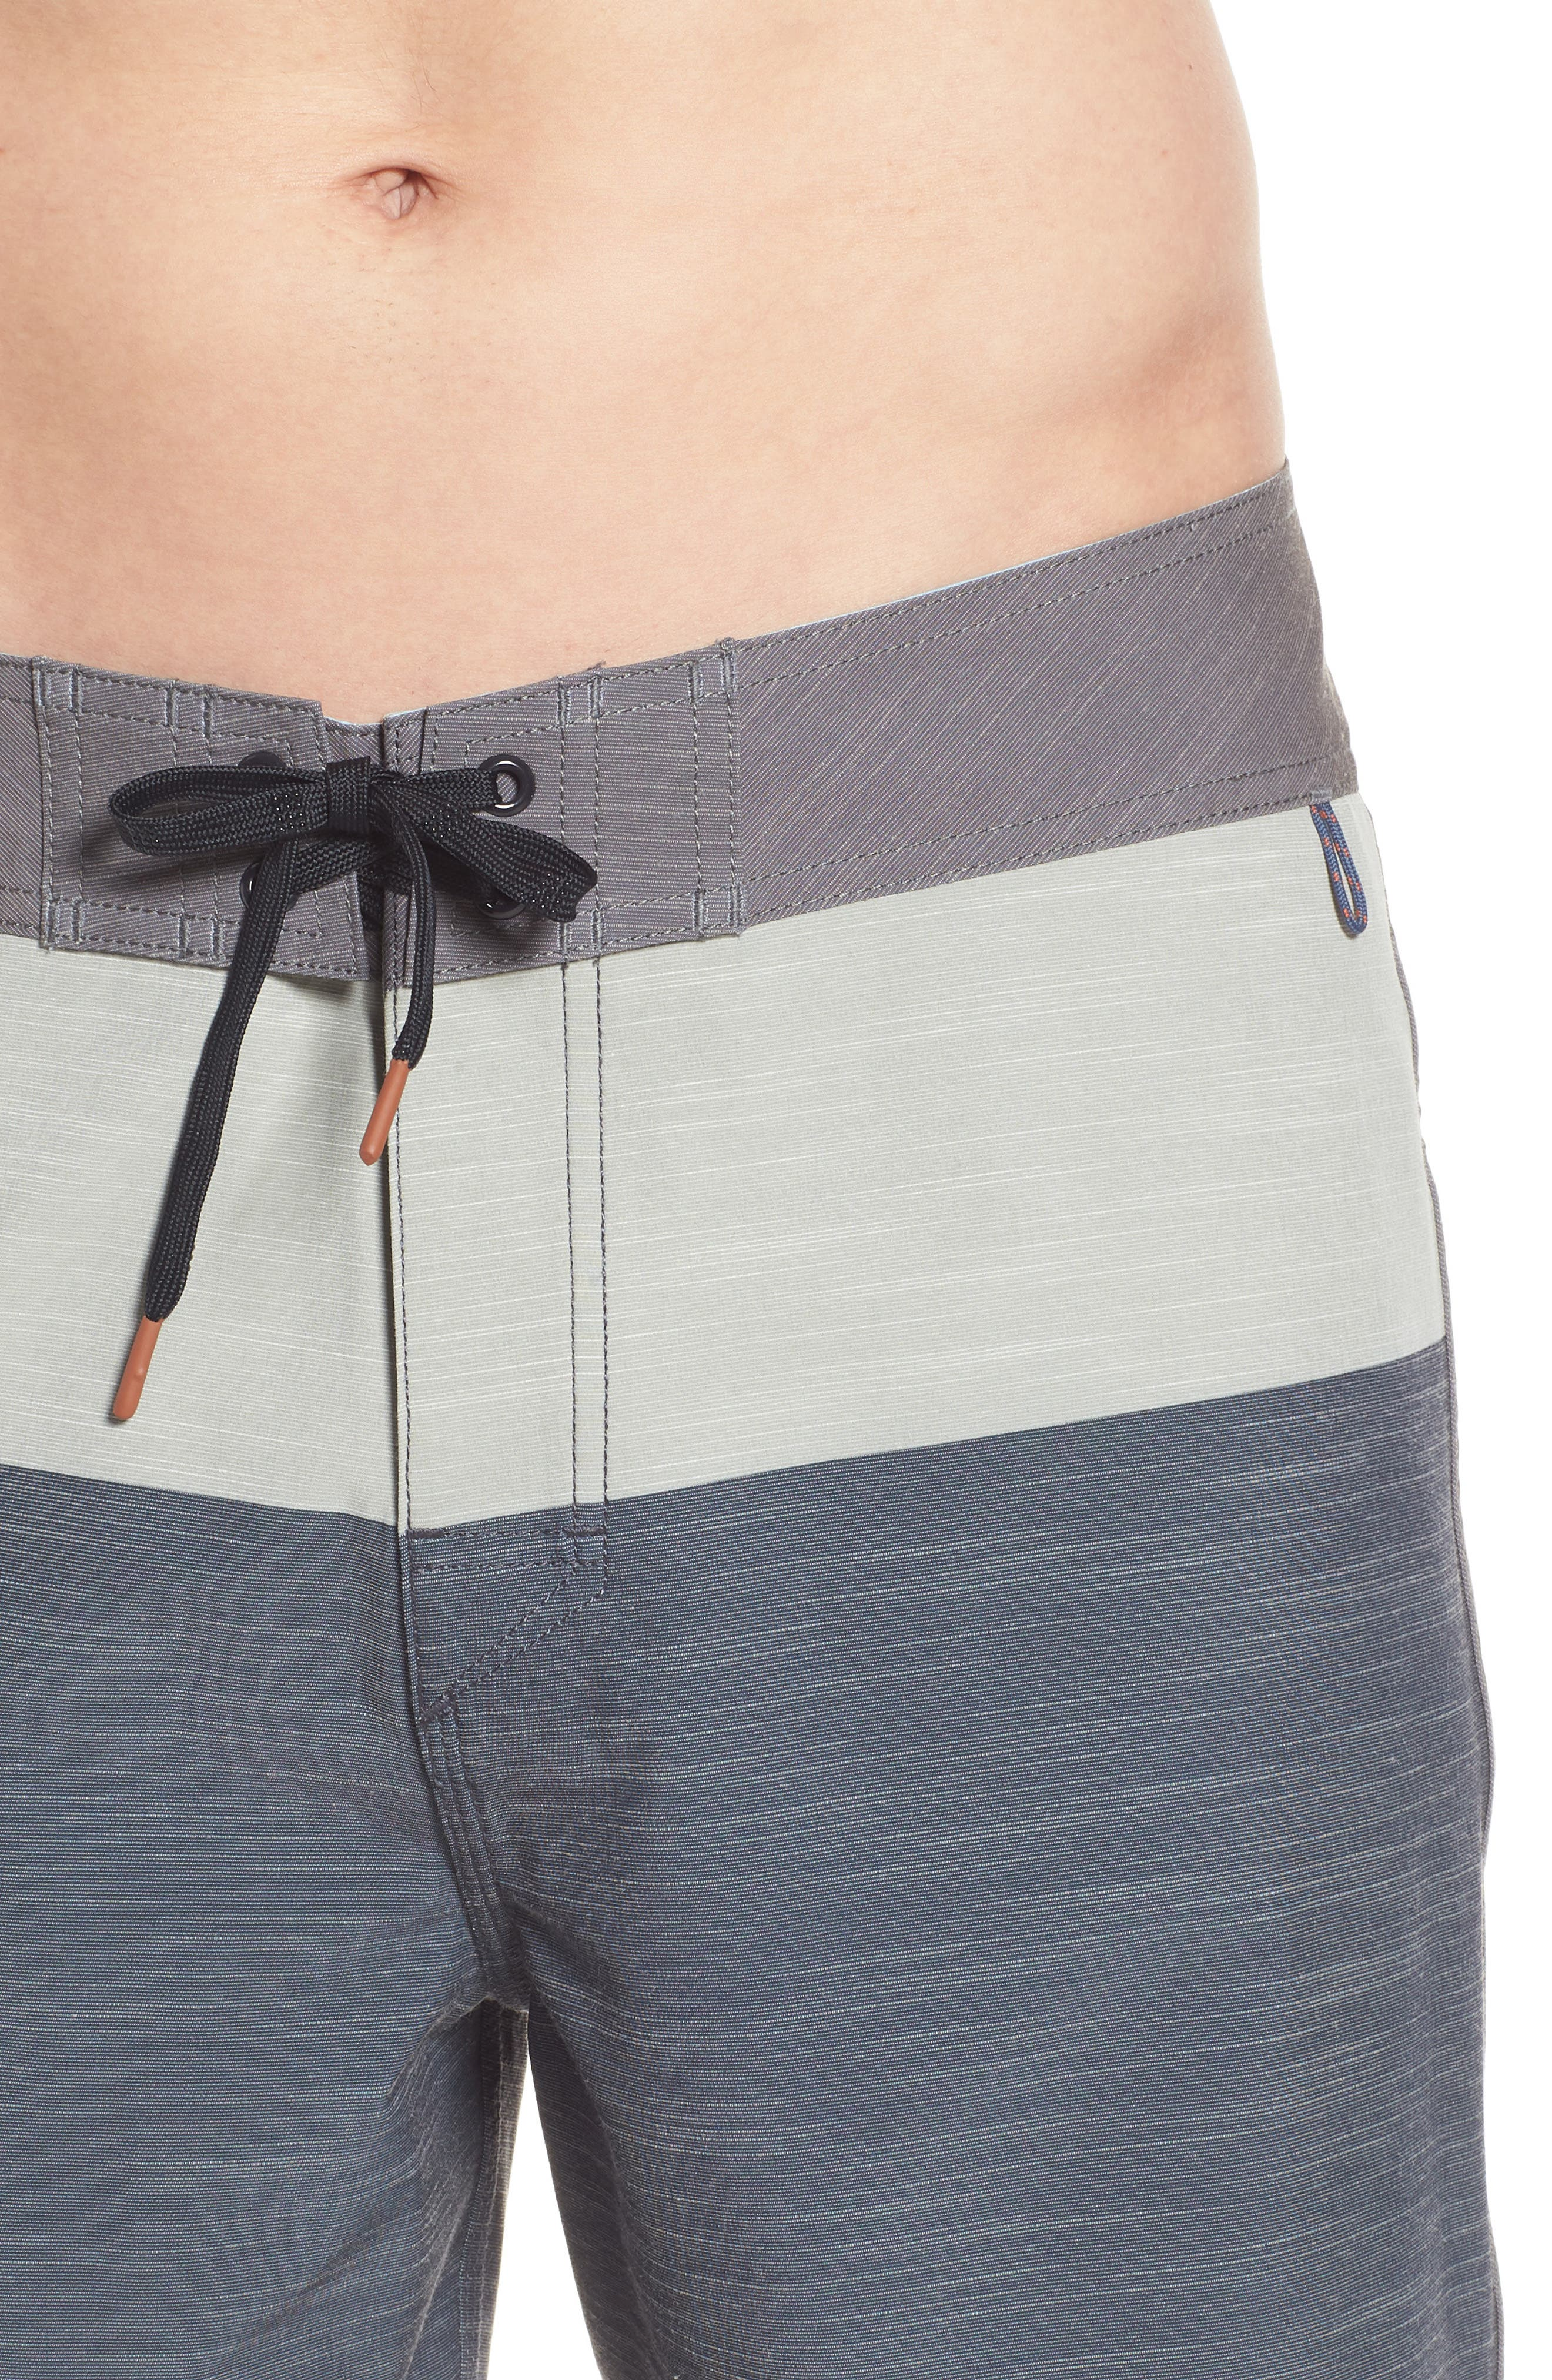 Beachcomber Board Shorts,                             Alternate thumbnail 4, color,                             CHARCOAL